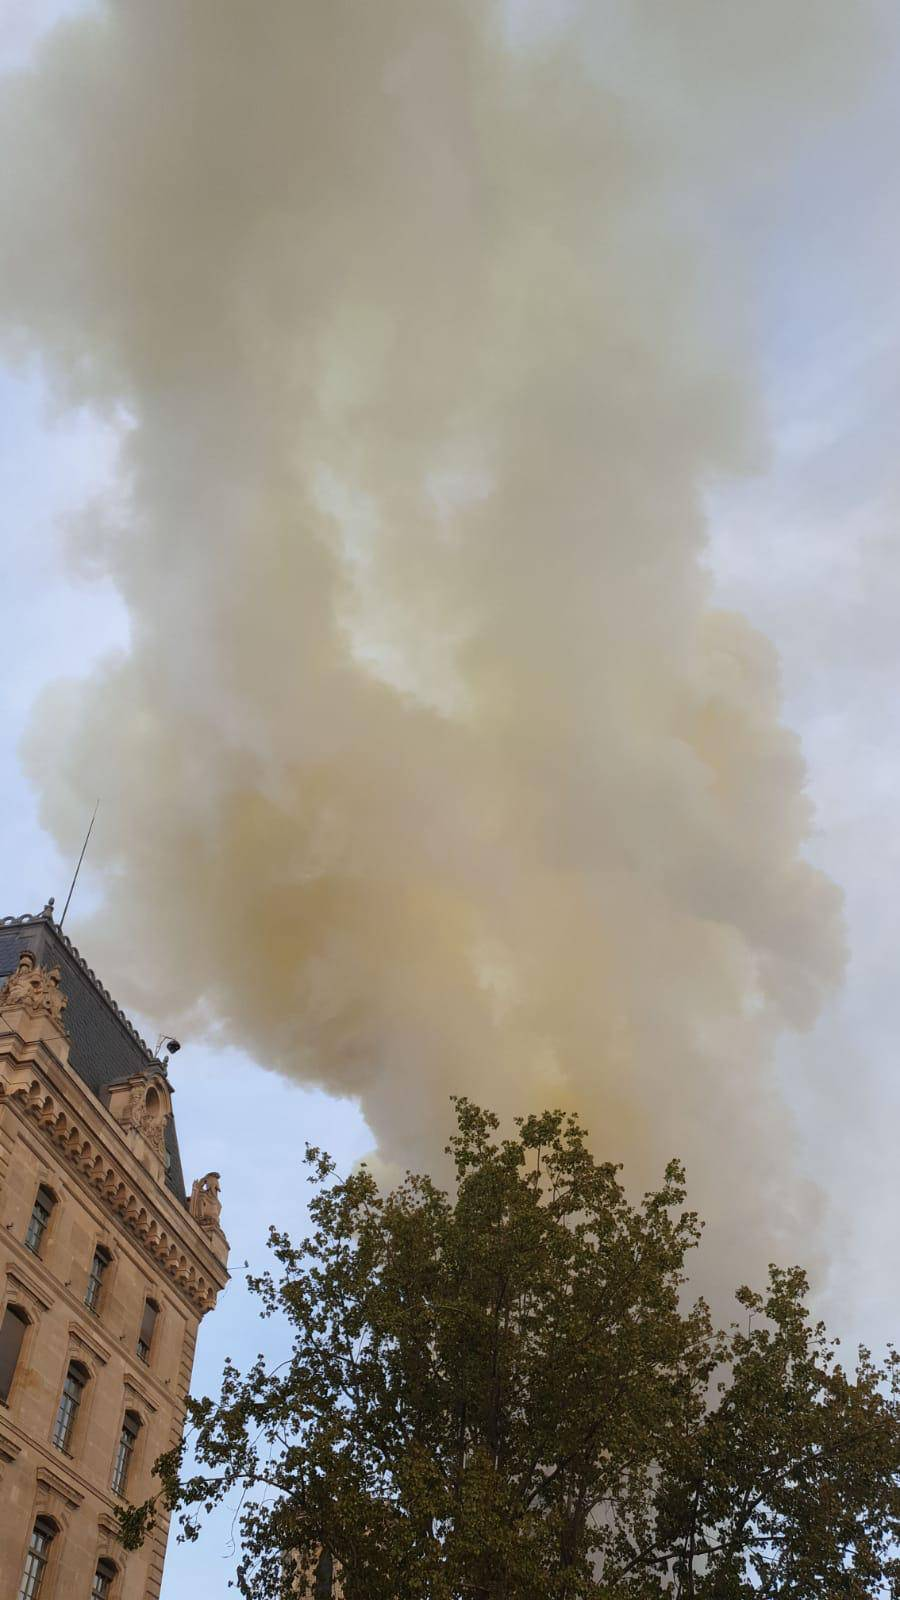 Požar u Notre Dame: 'Najgore je prošlo, crkva se neće srušiti'